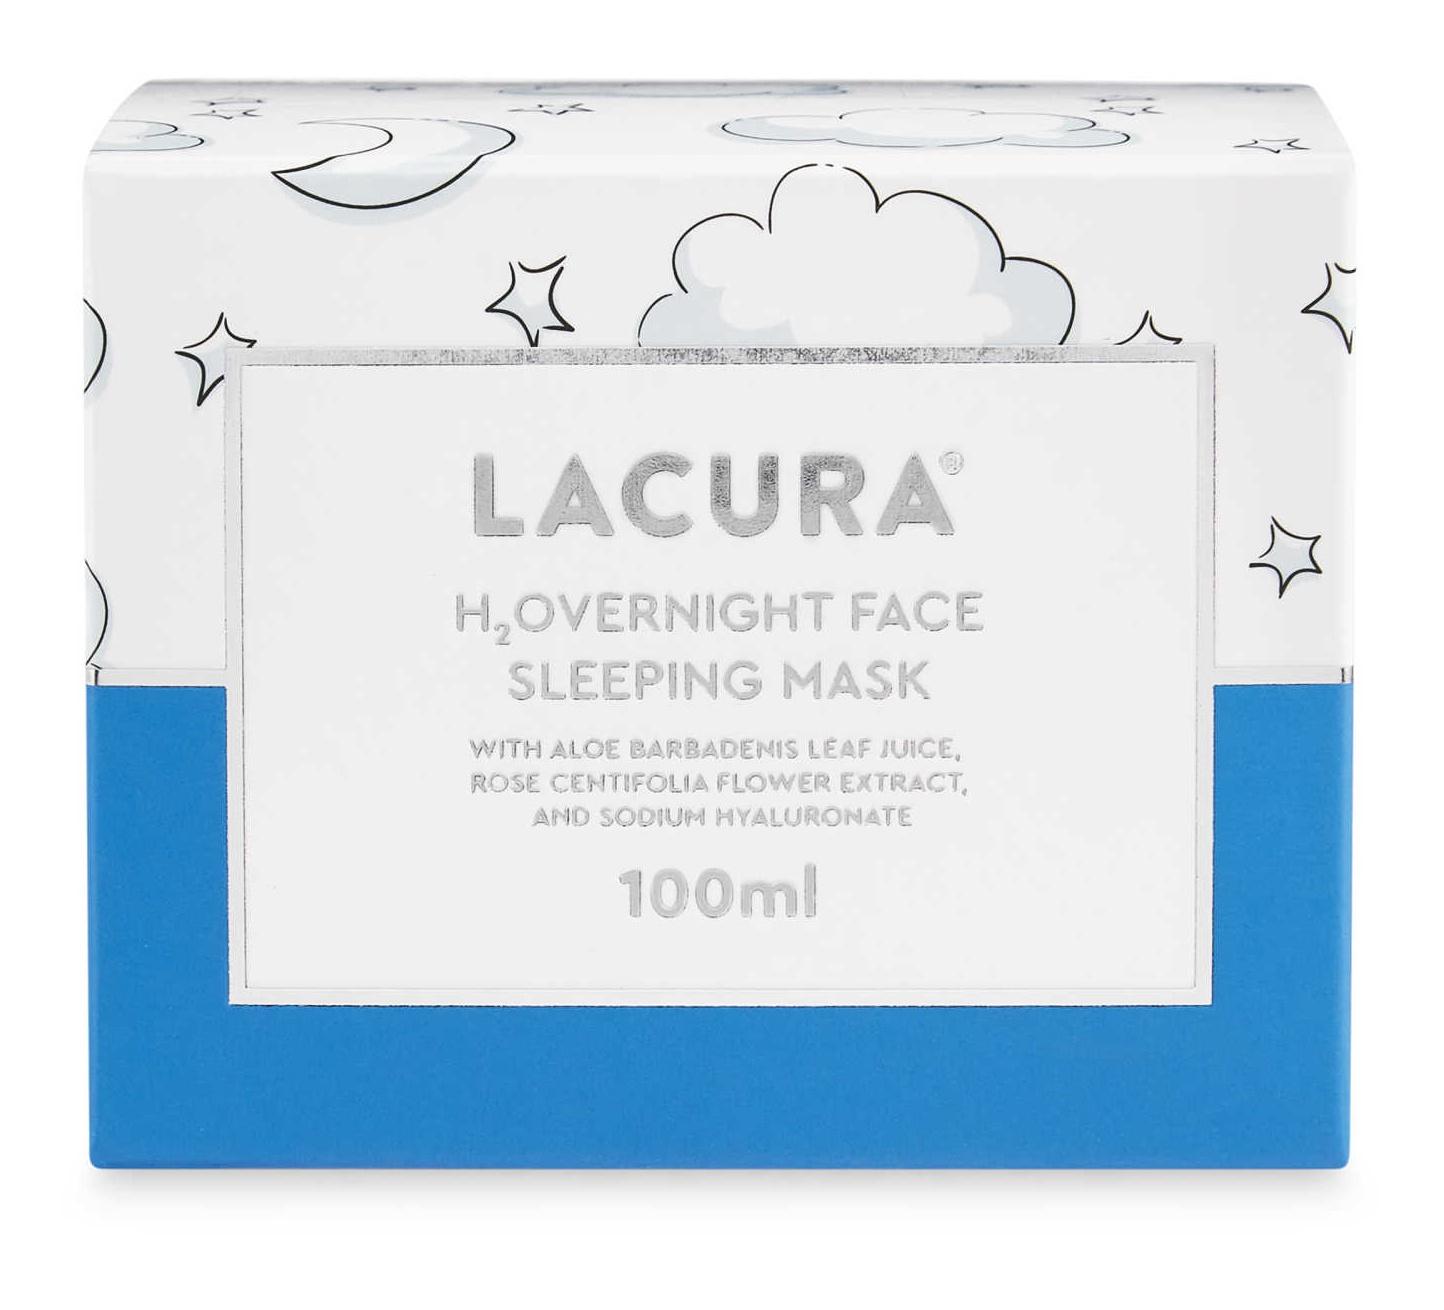 LACURA H20 Sleep Mask